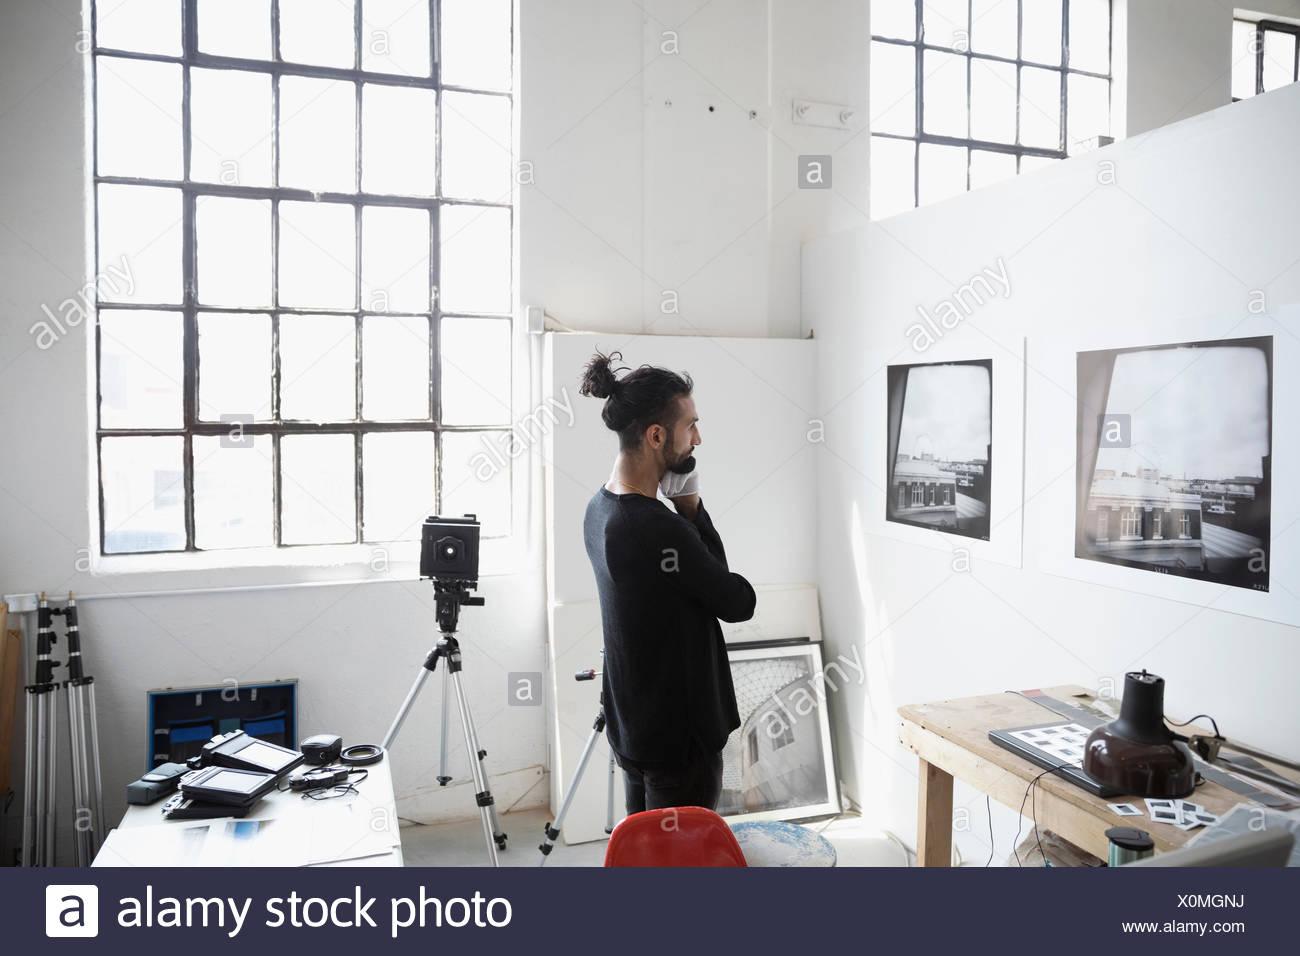 focused male photographer examining